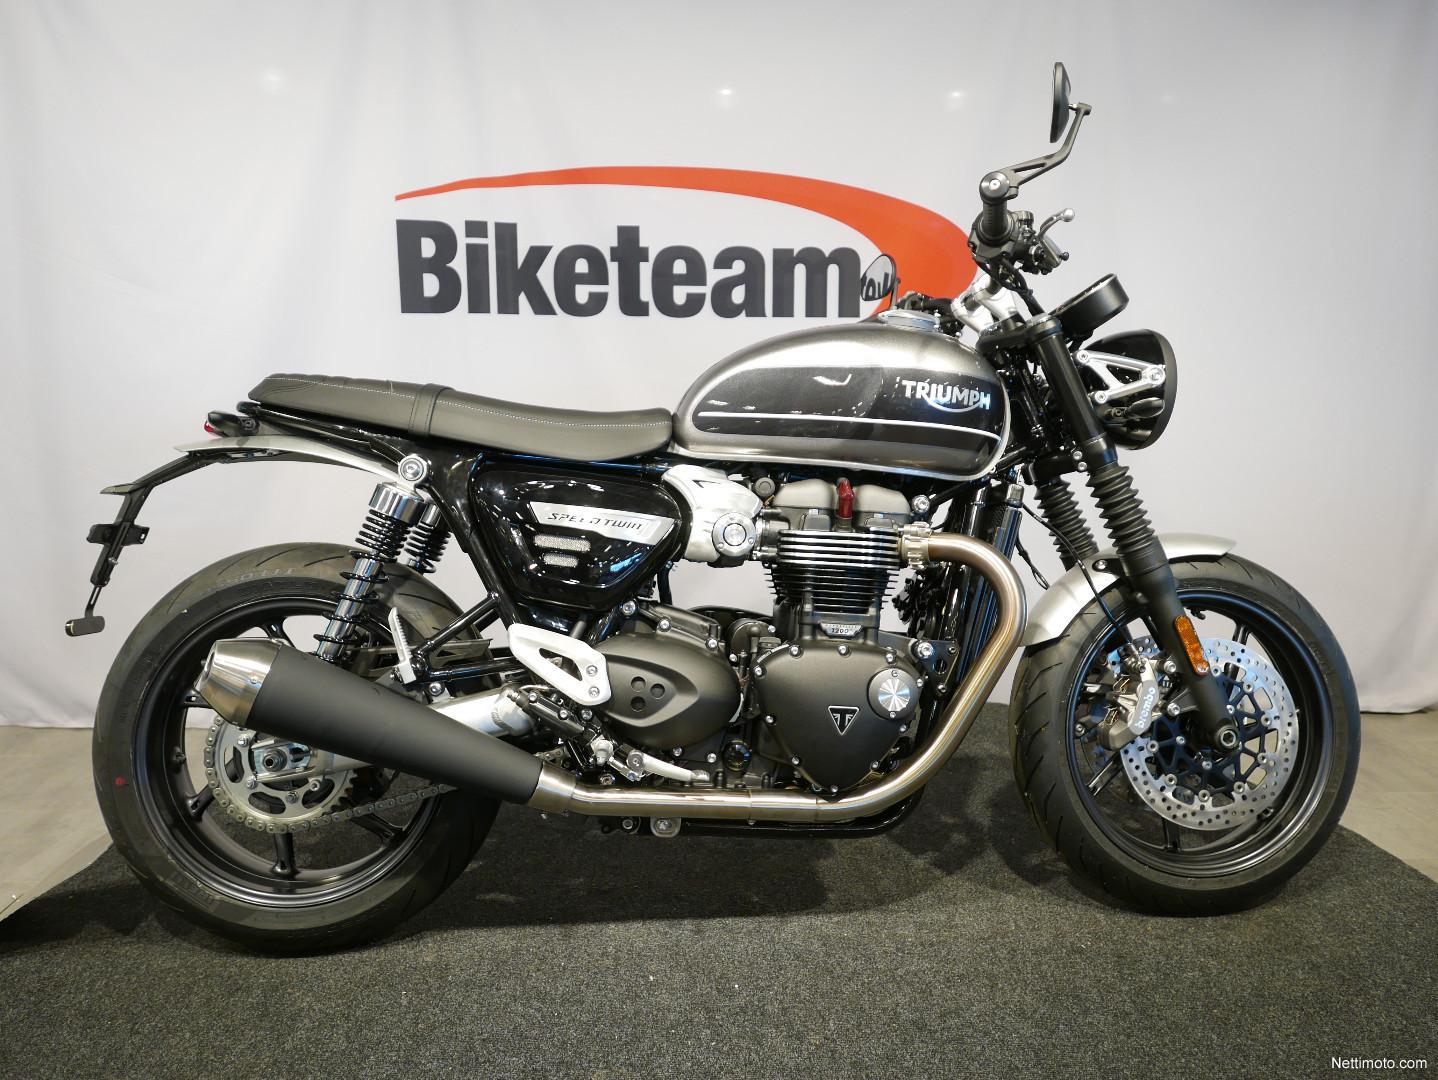 Triumph Speed Twin 1200 1 200 Cm³ 2019 Vantaa Motorcycle Nettimoto